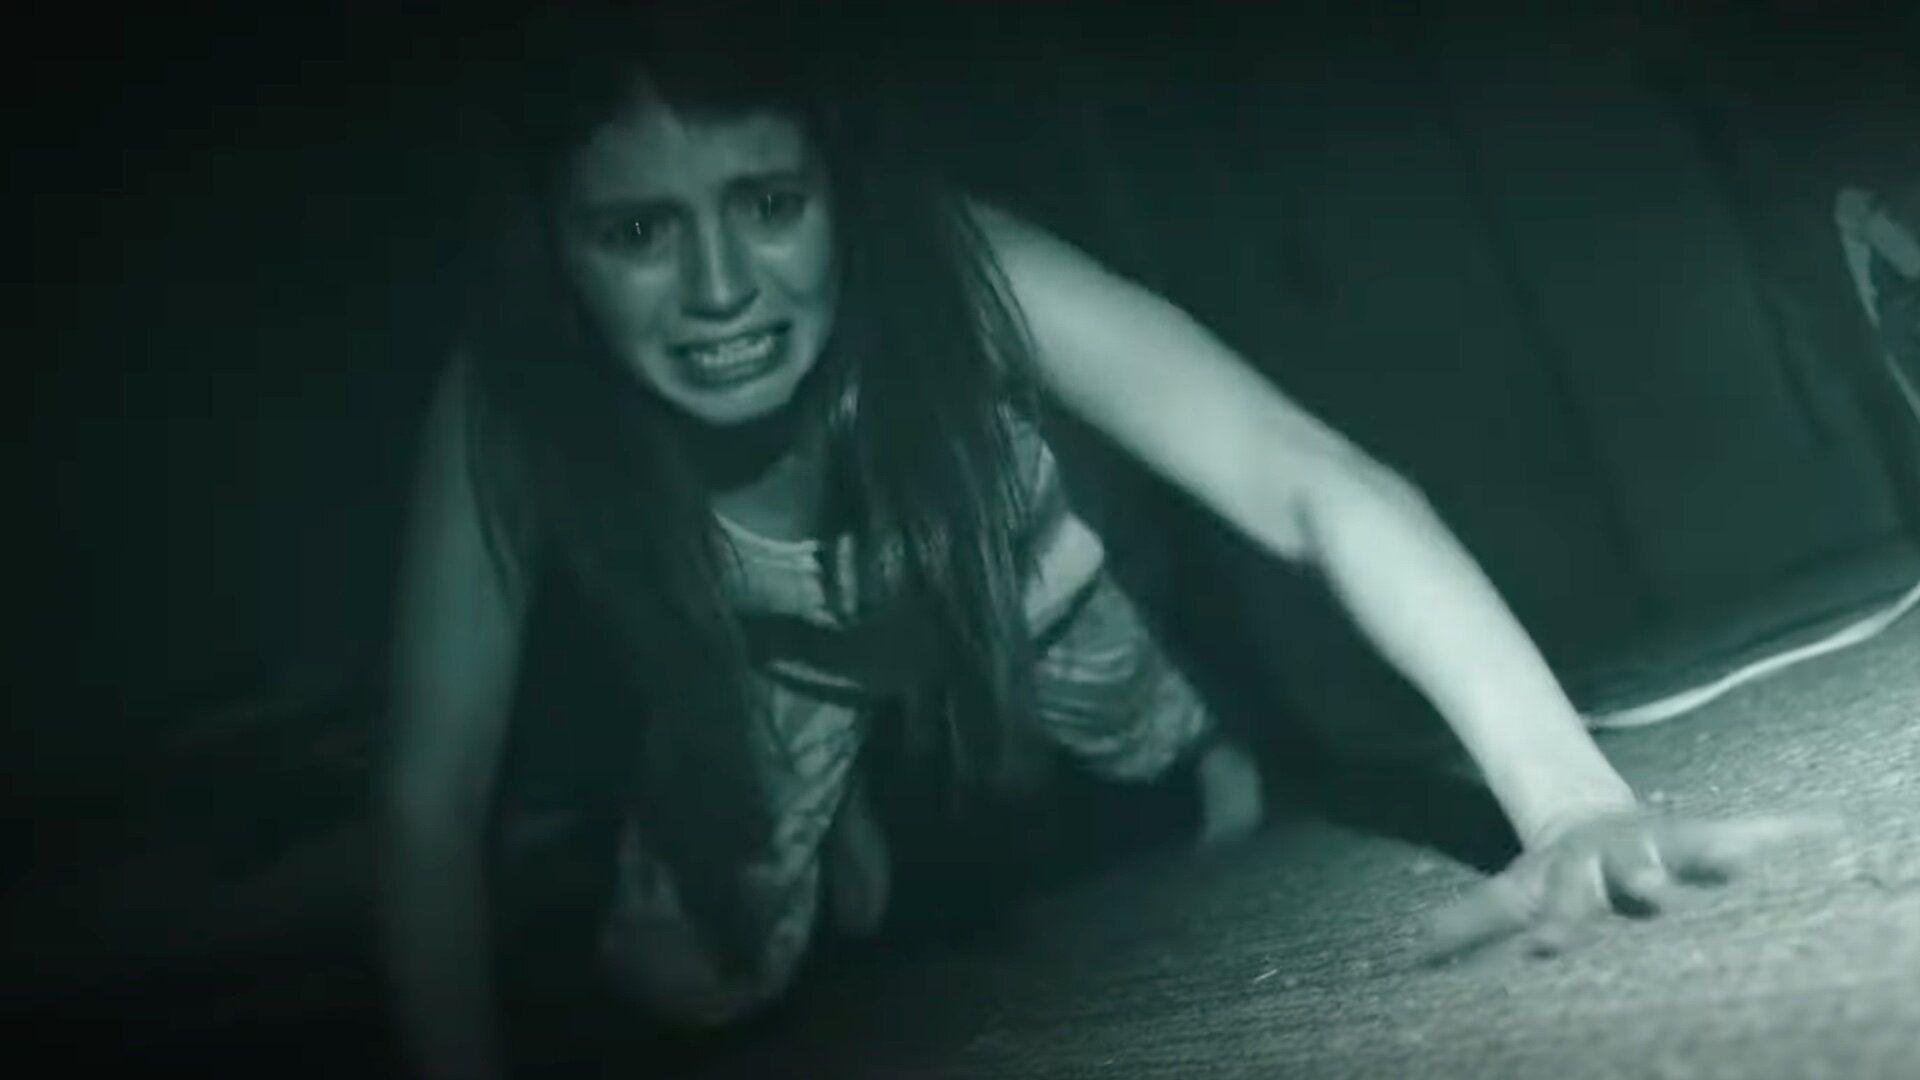 'Paranormal Activity: Next of Kin' – la saga renace en primer tráiler oficial